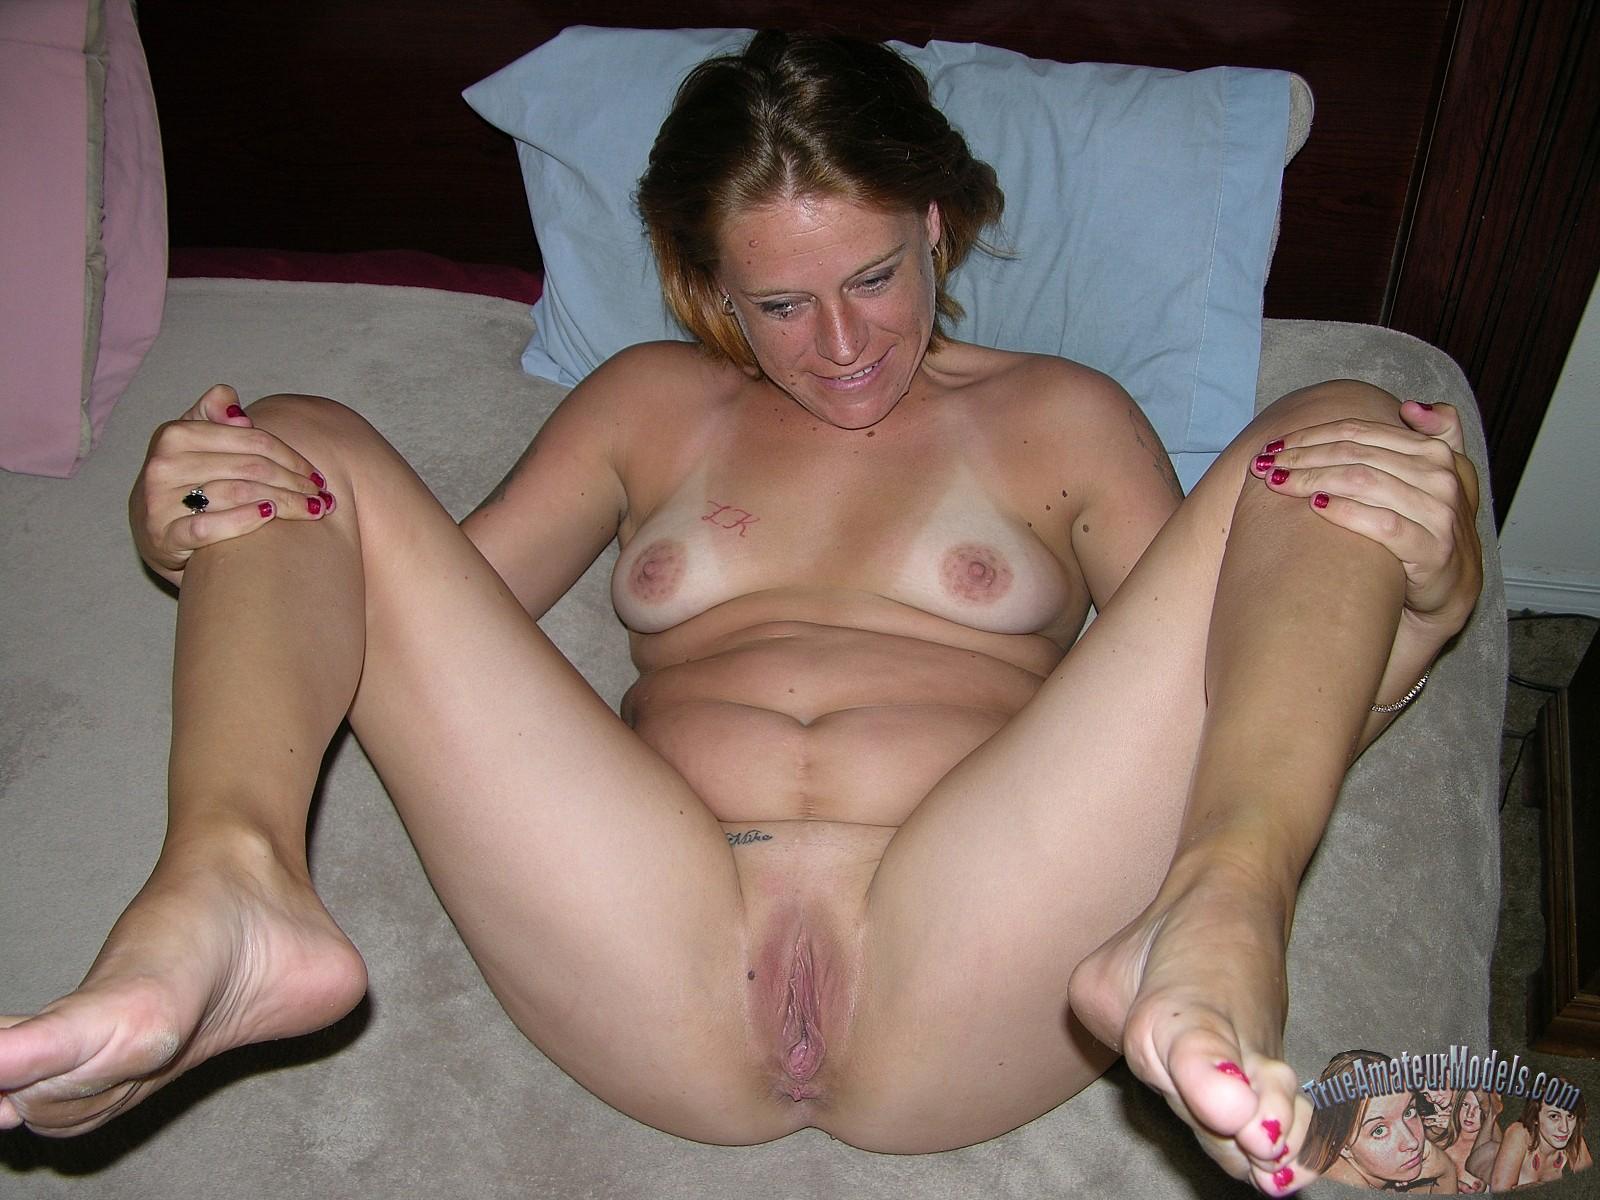 mature italian women nude spreading